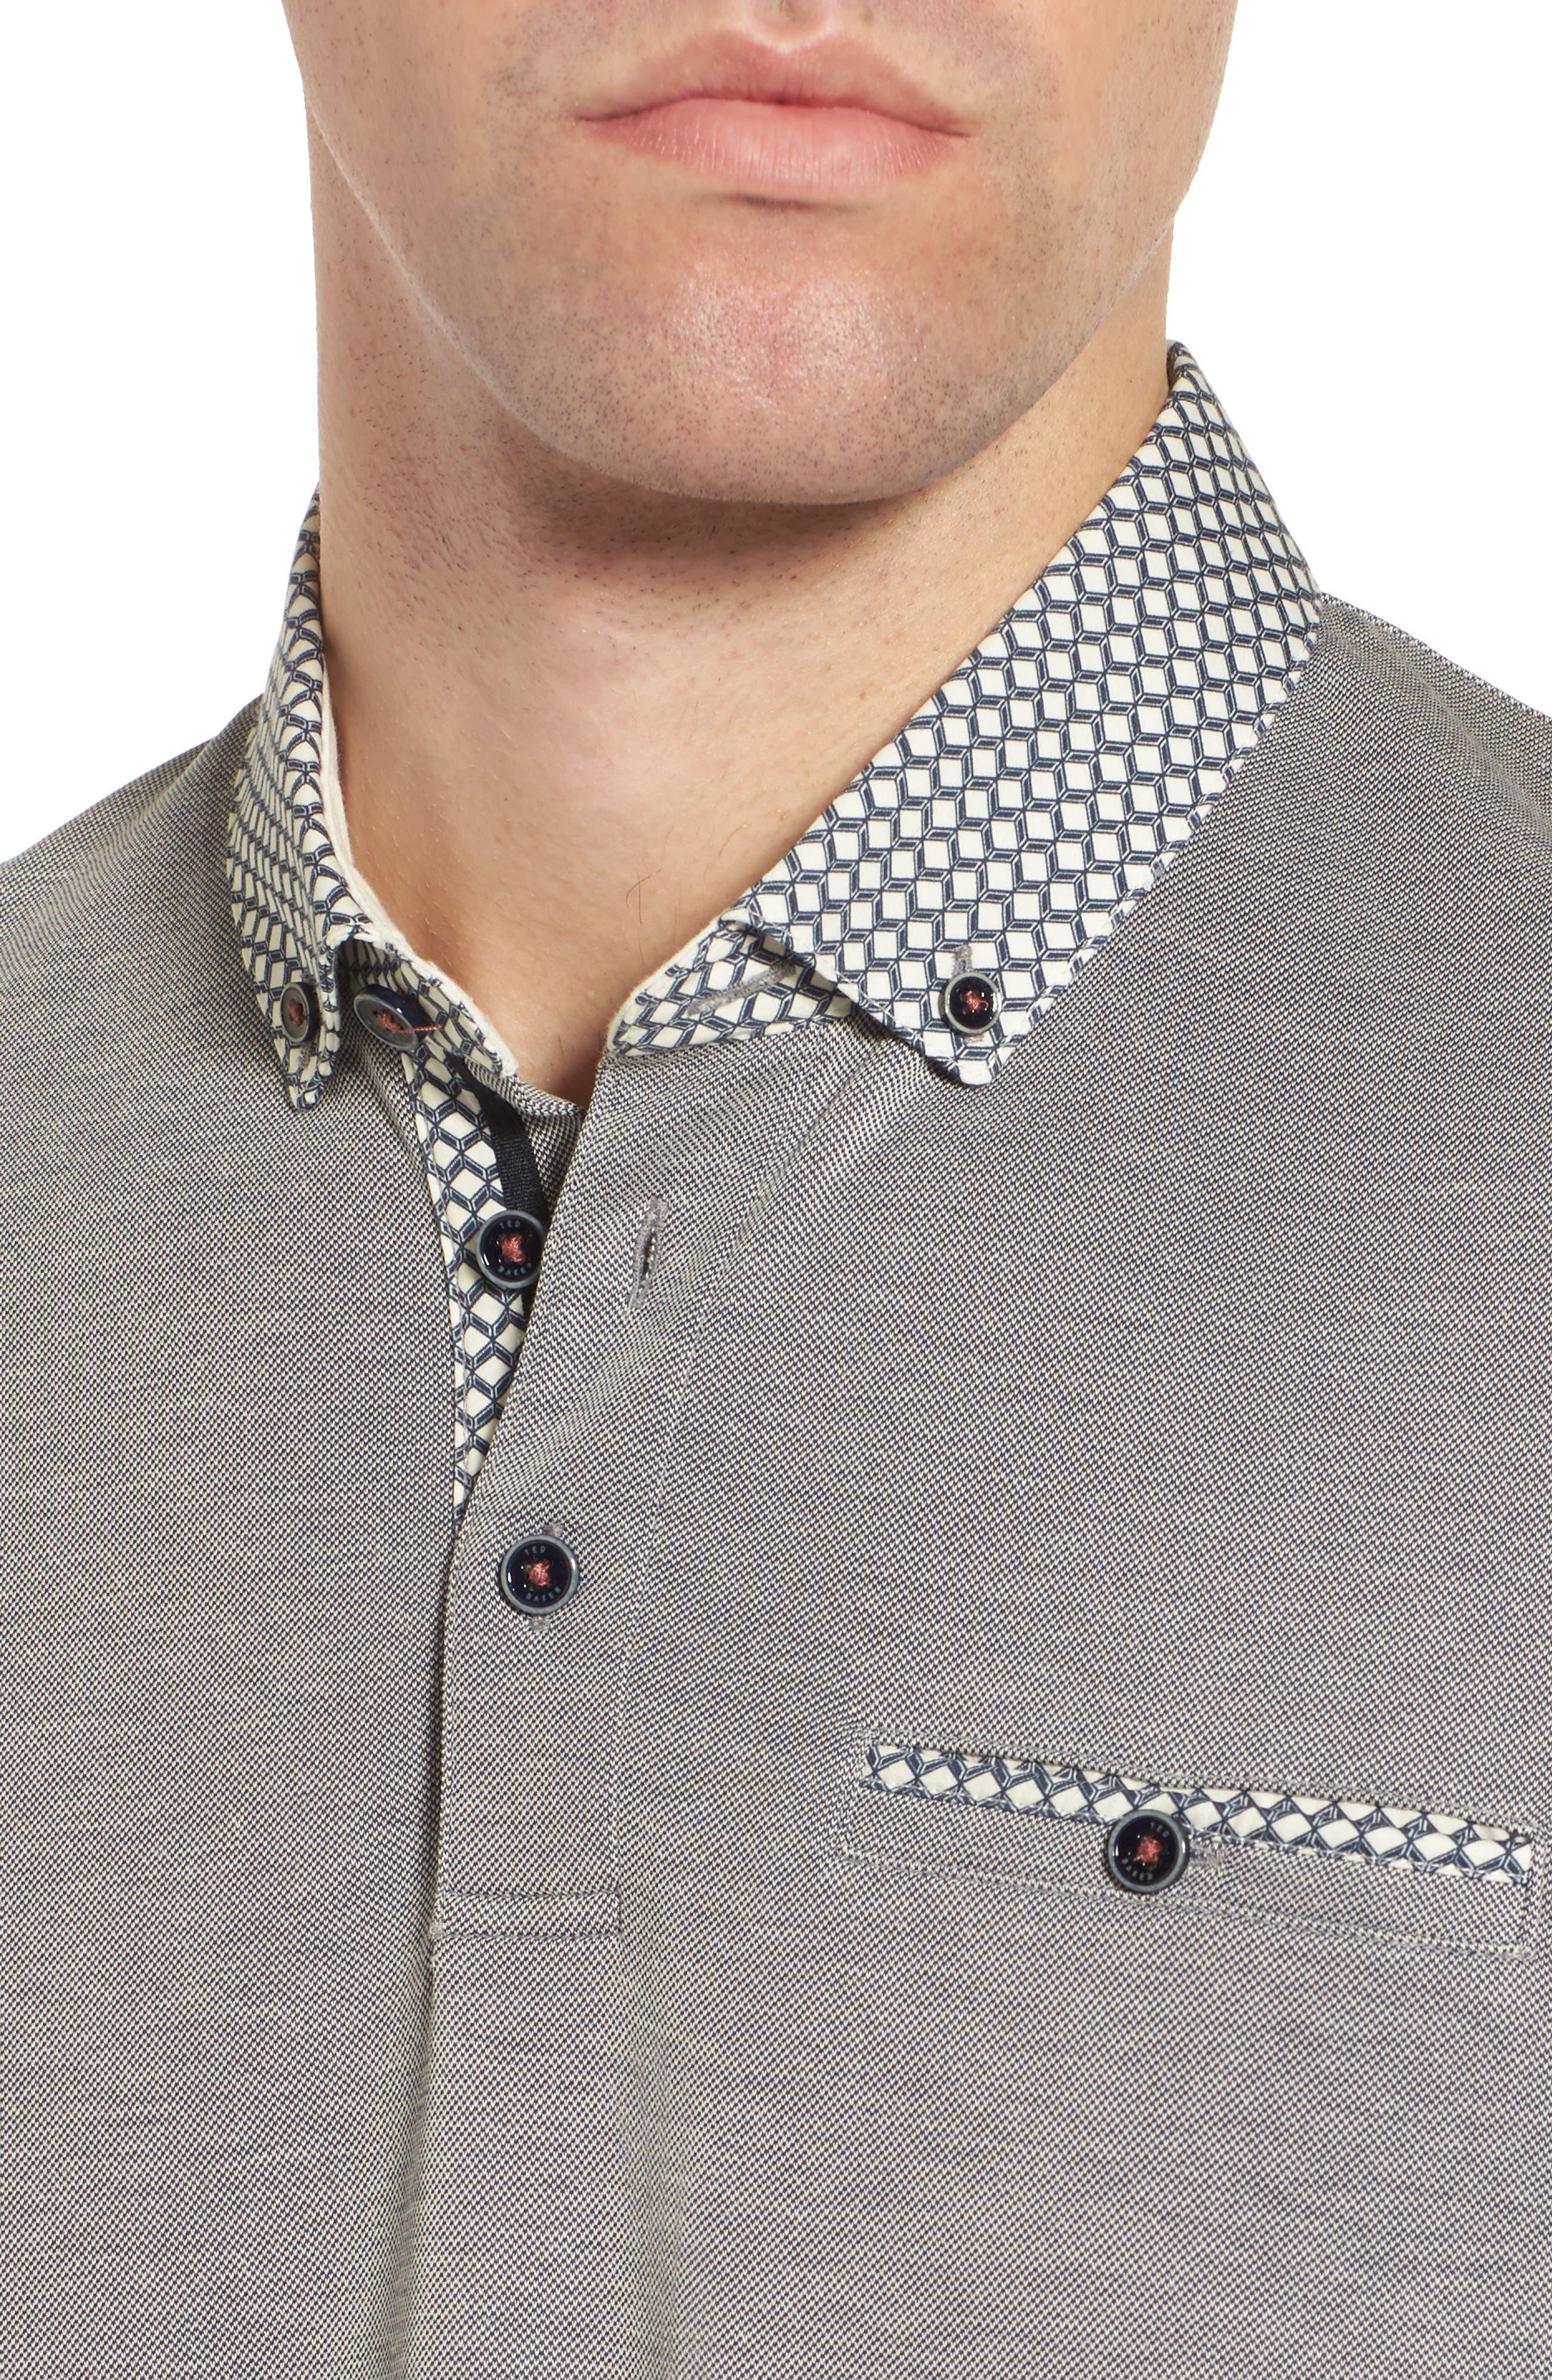 Tizu Trim Fit Polo Shirt,                             Alternate thumbnail 4, color,                             Navy